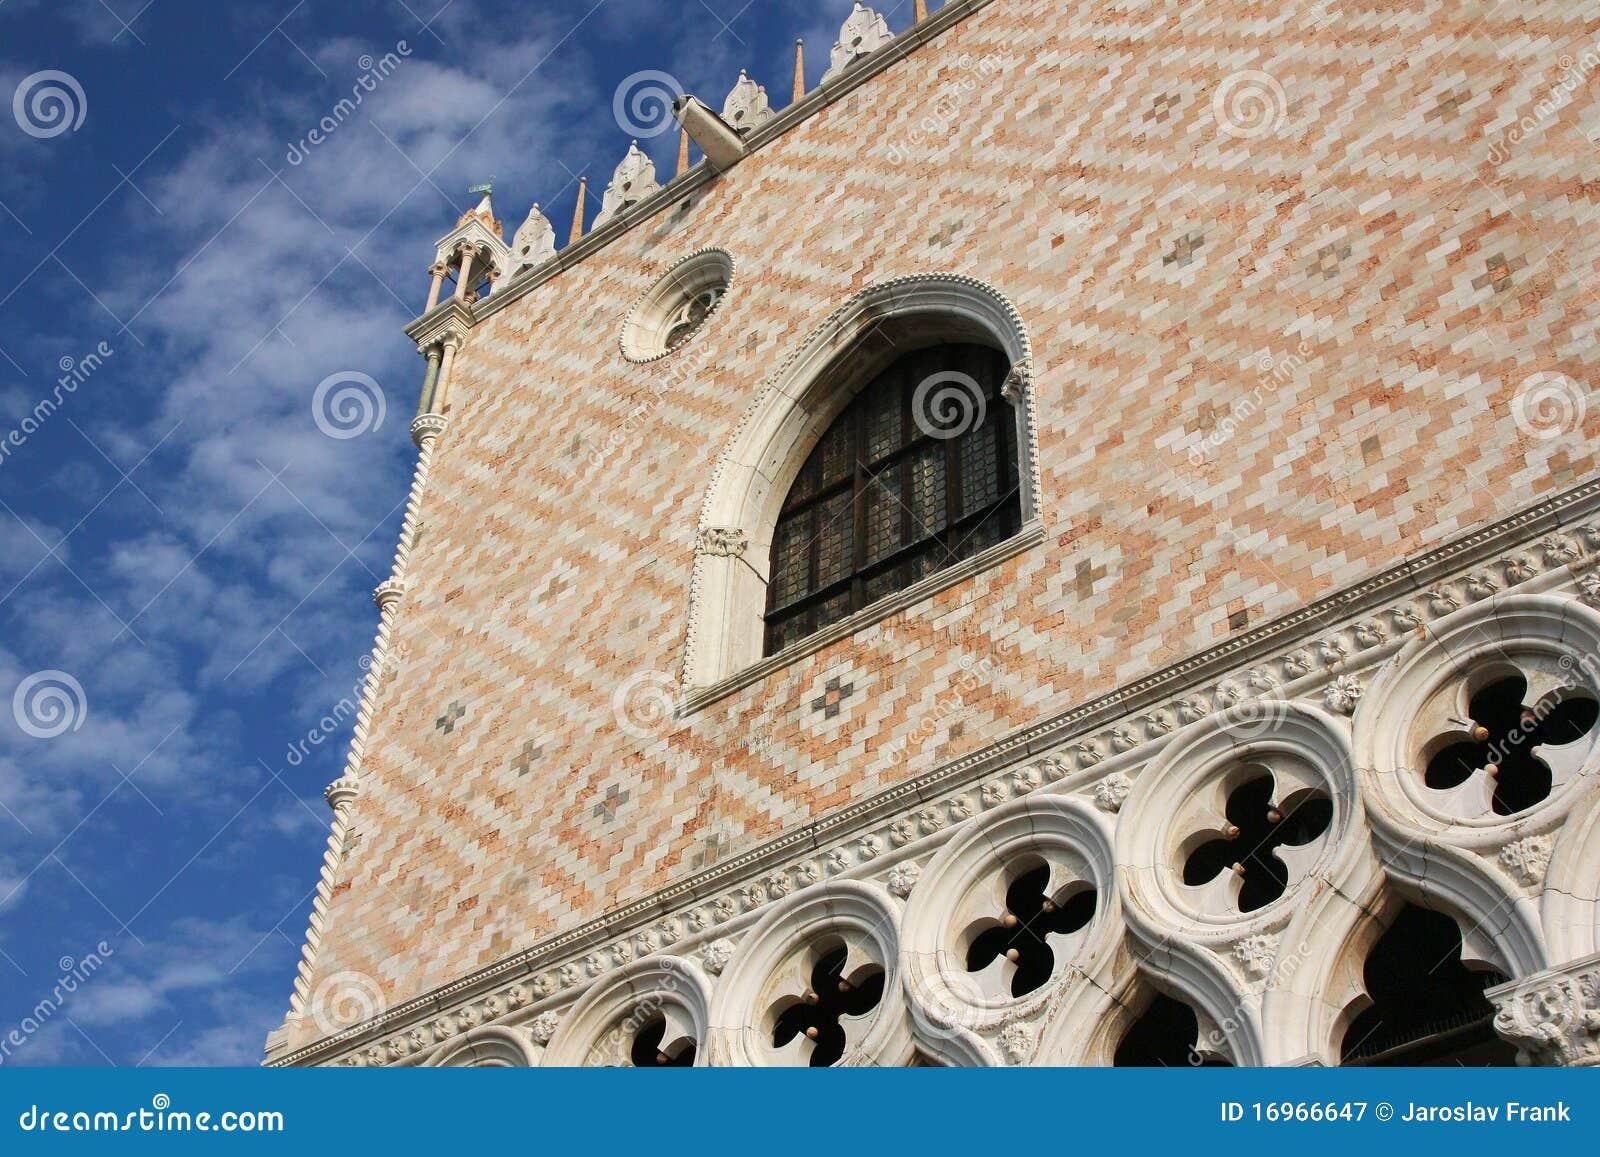 Palácio Ducal em Veneza (Italy)